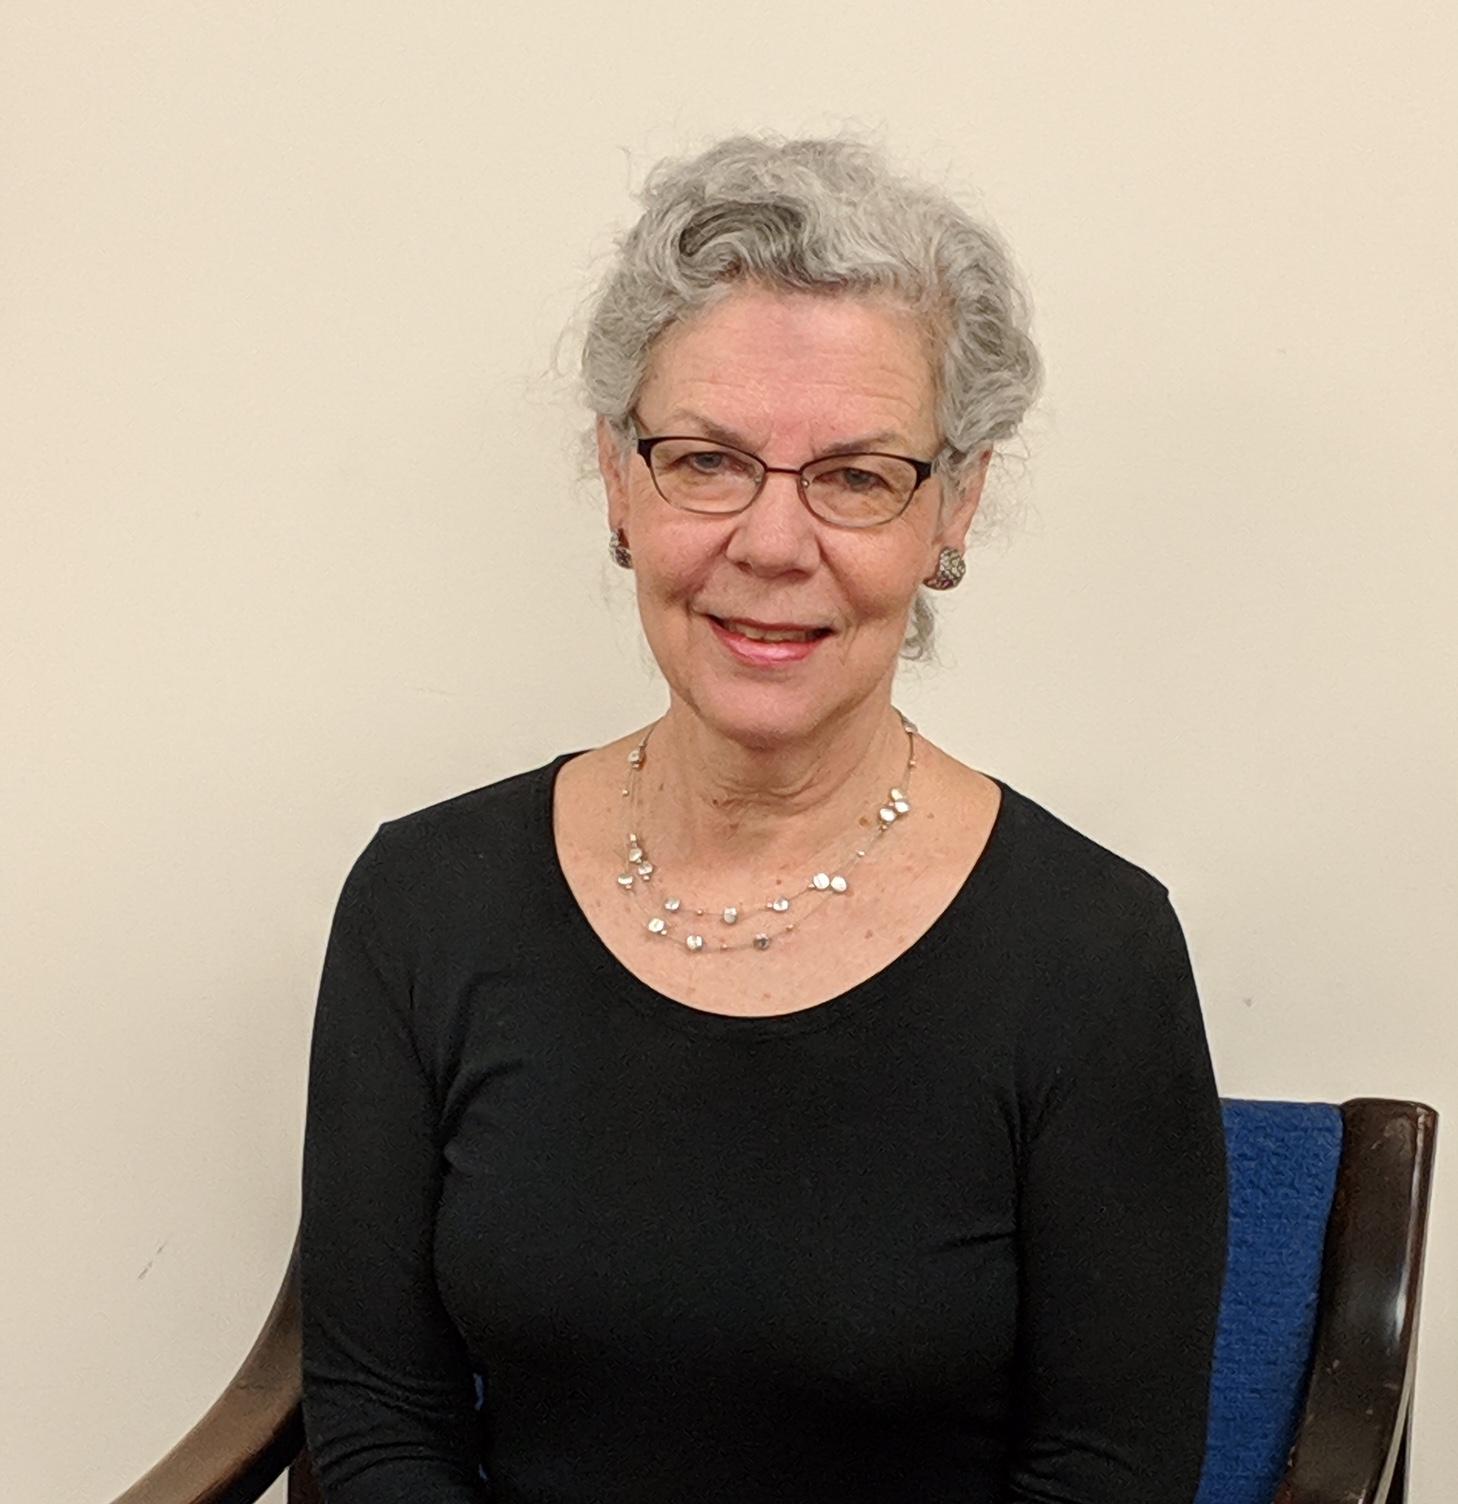 Debbie Pauls